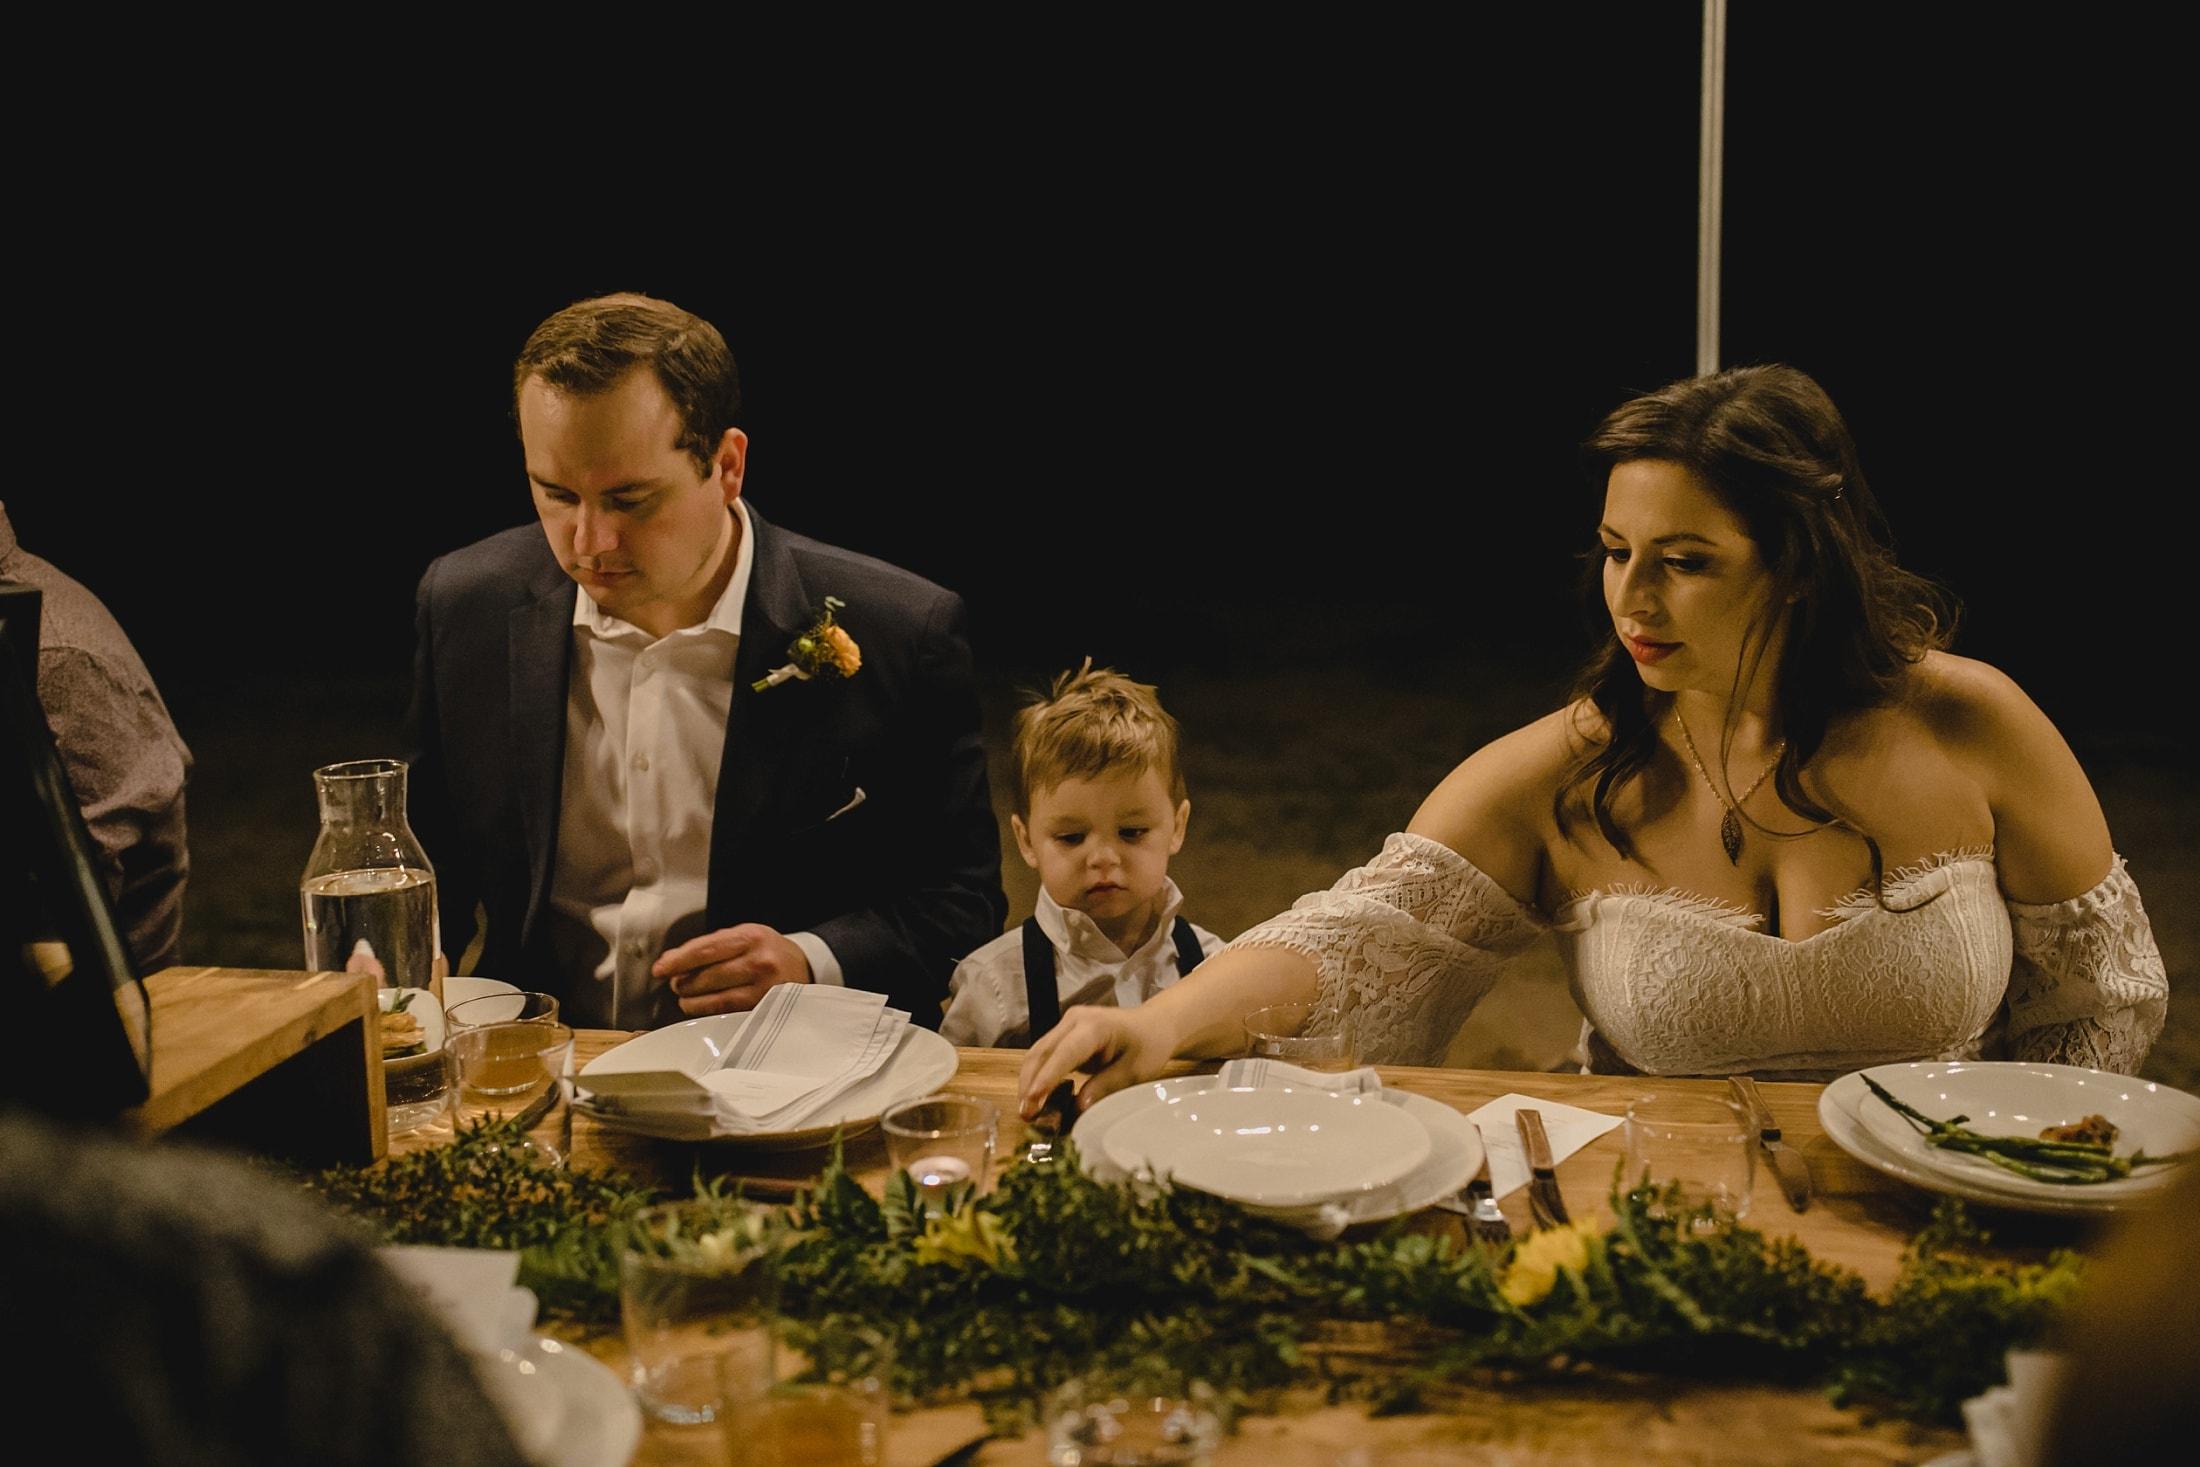 wedding reception outdoors under string lights in Arizona desert